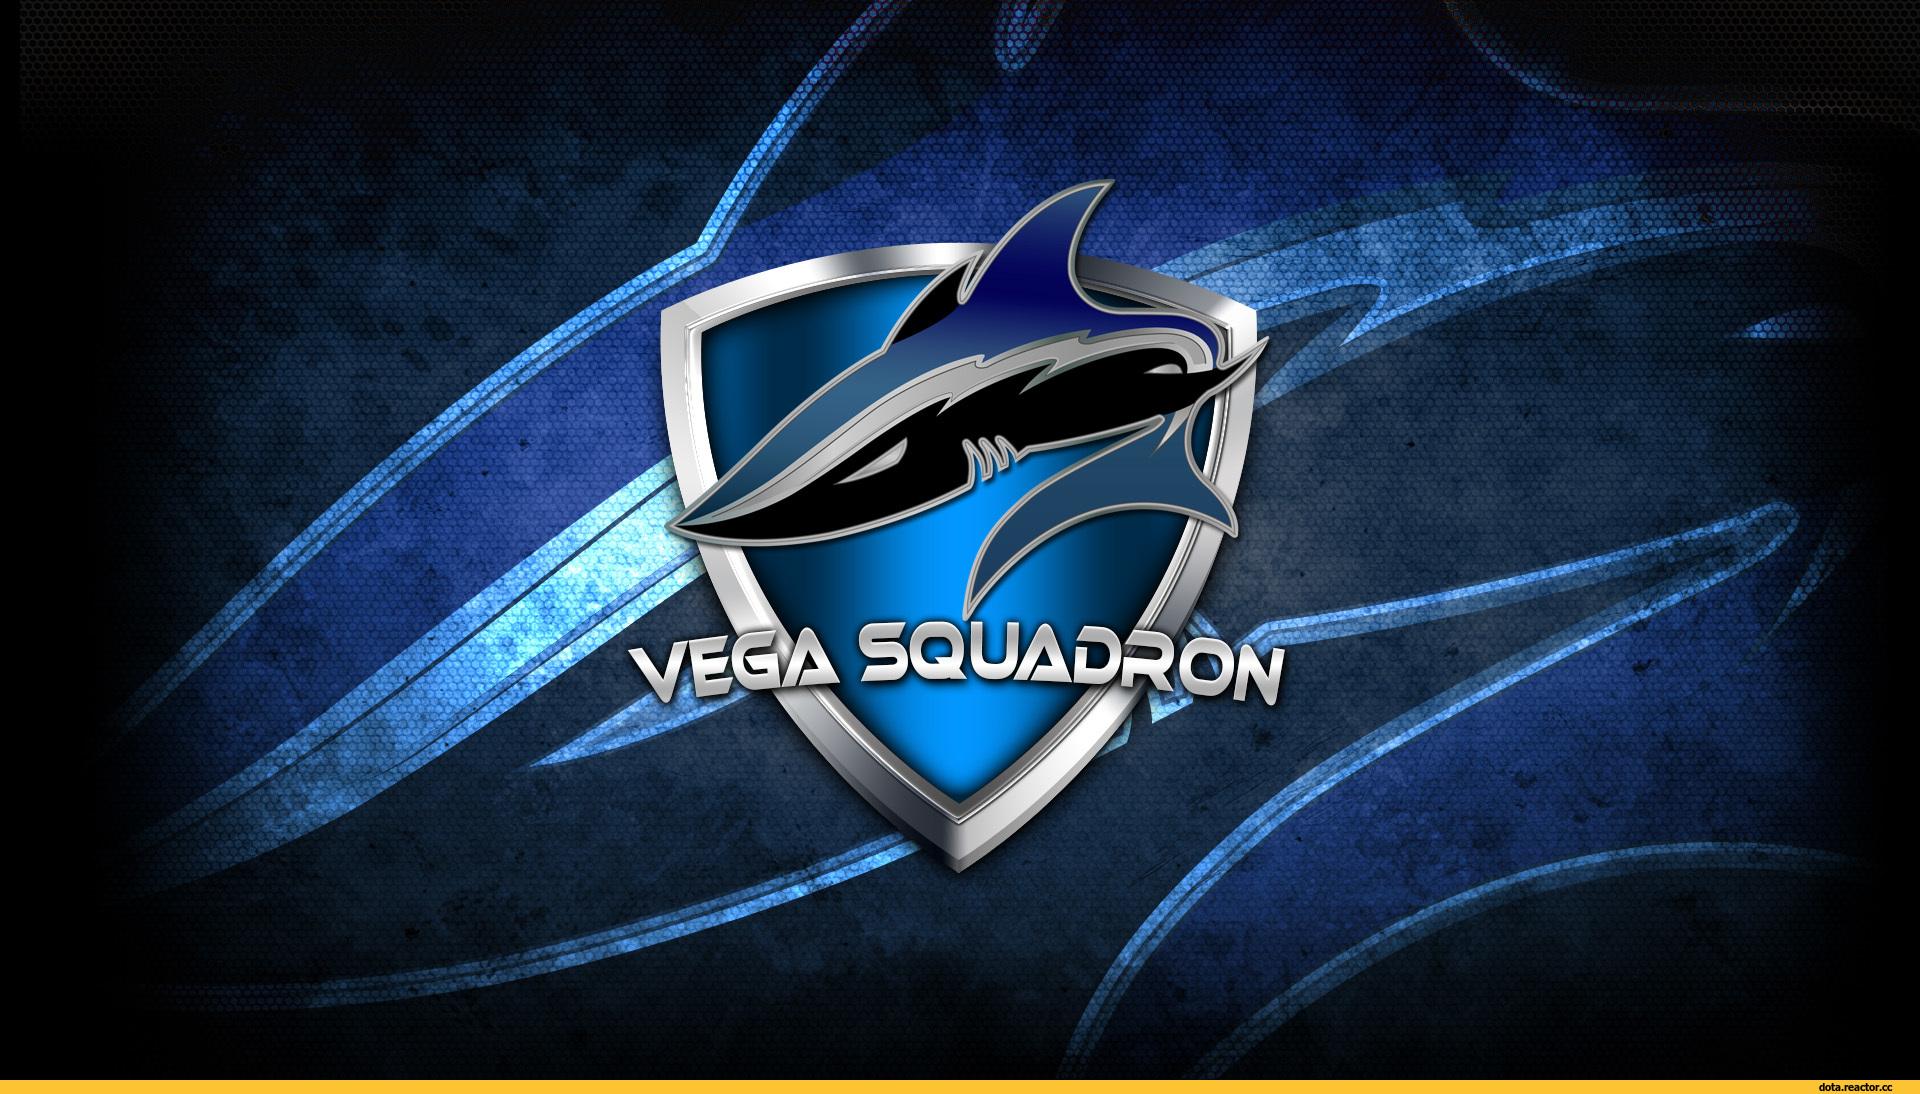 Новый состав Vega Squadron